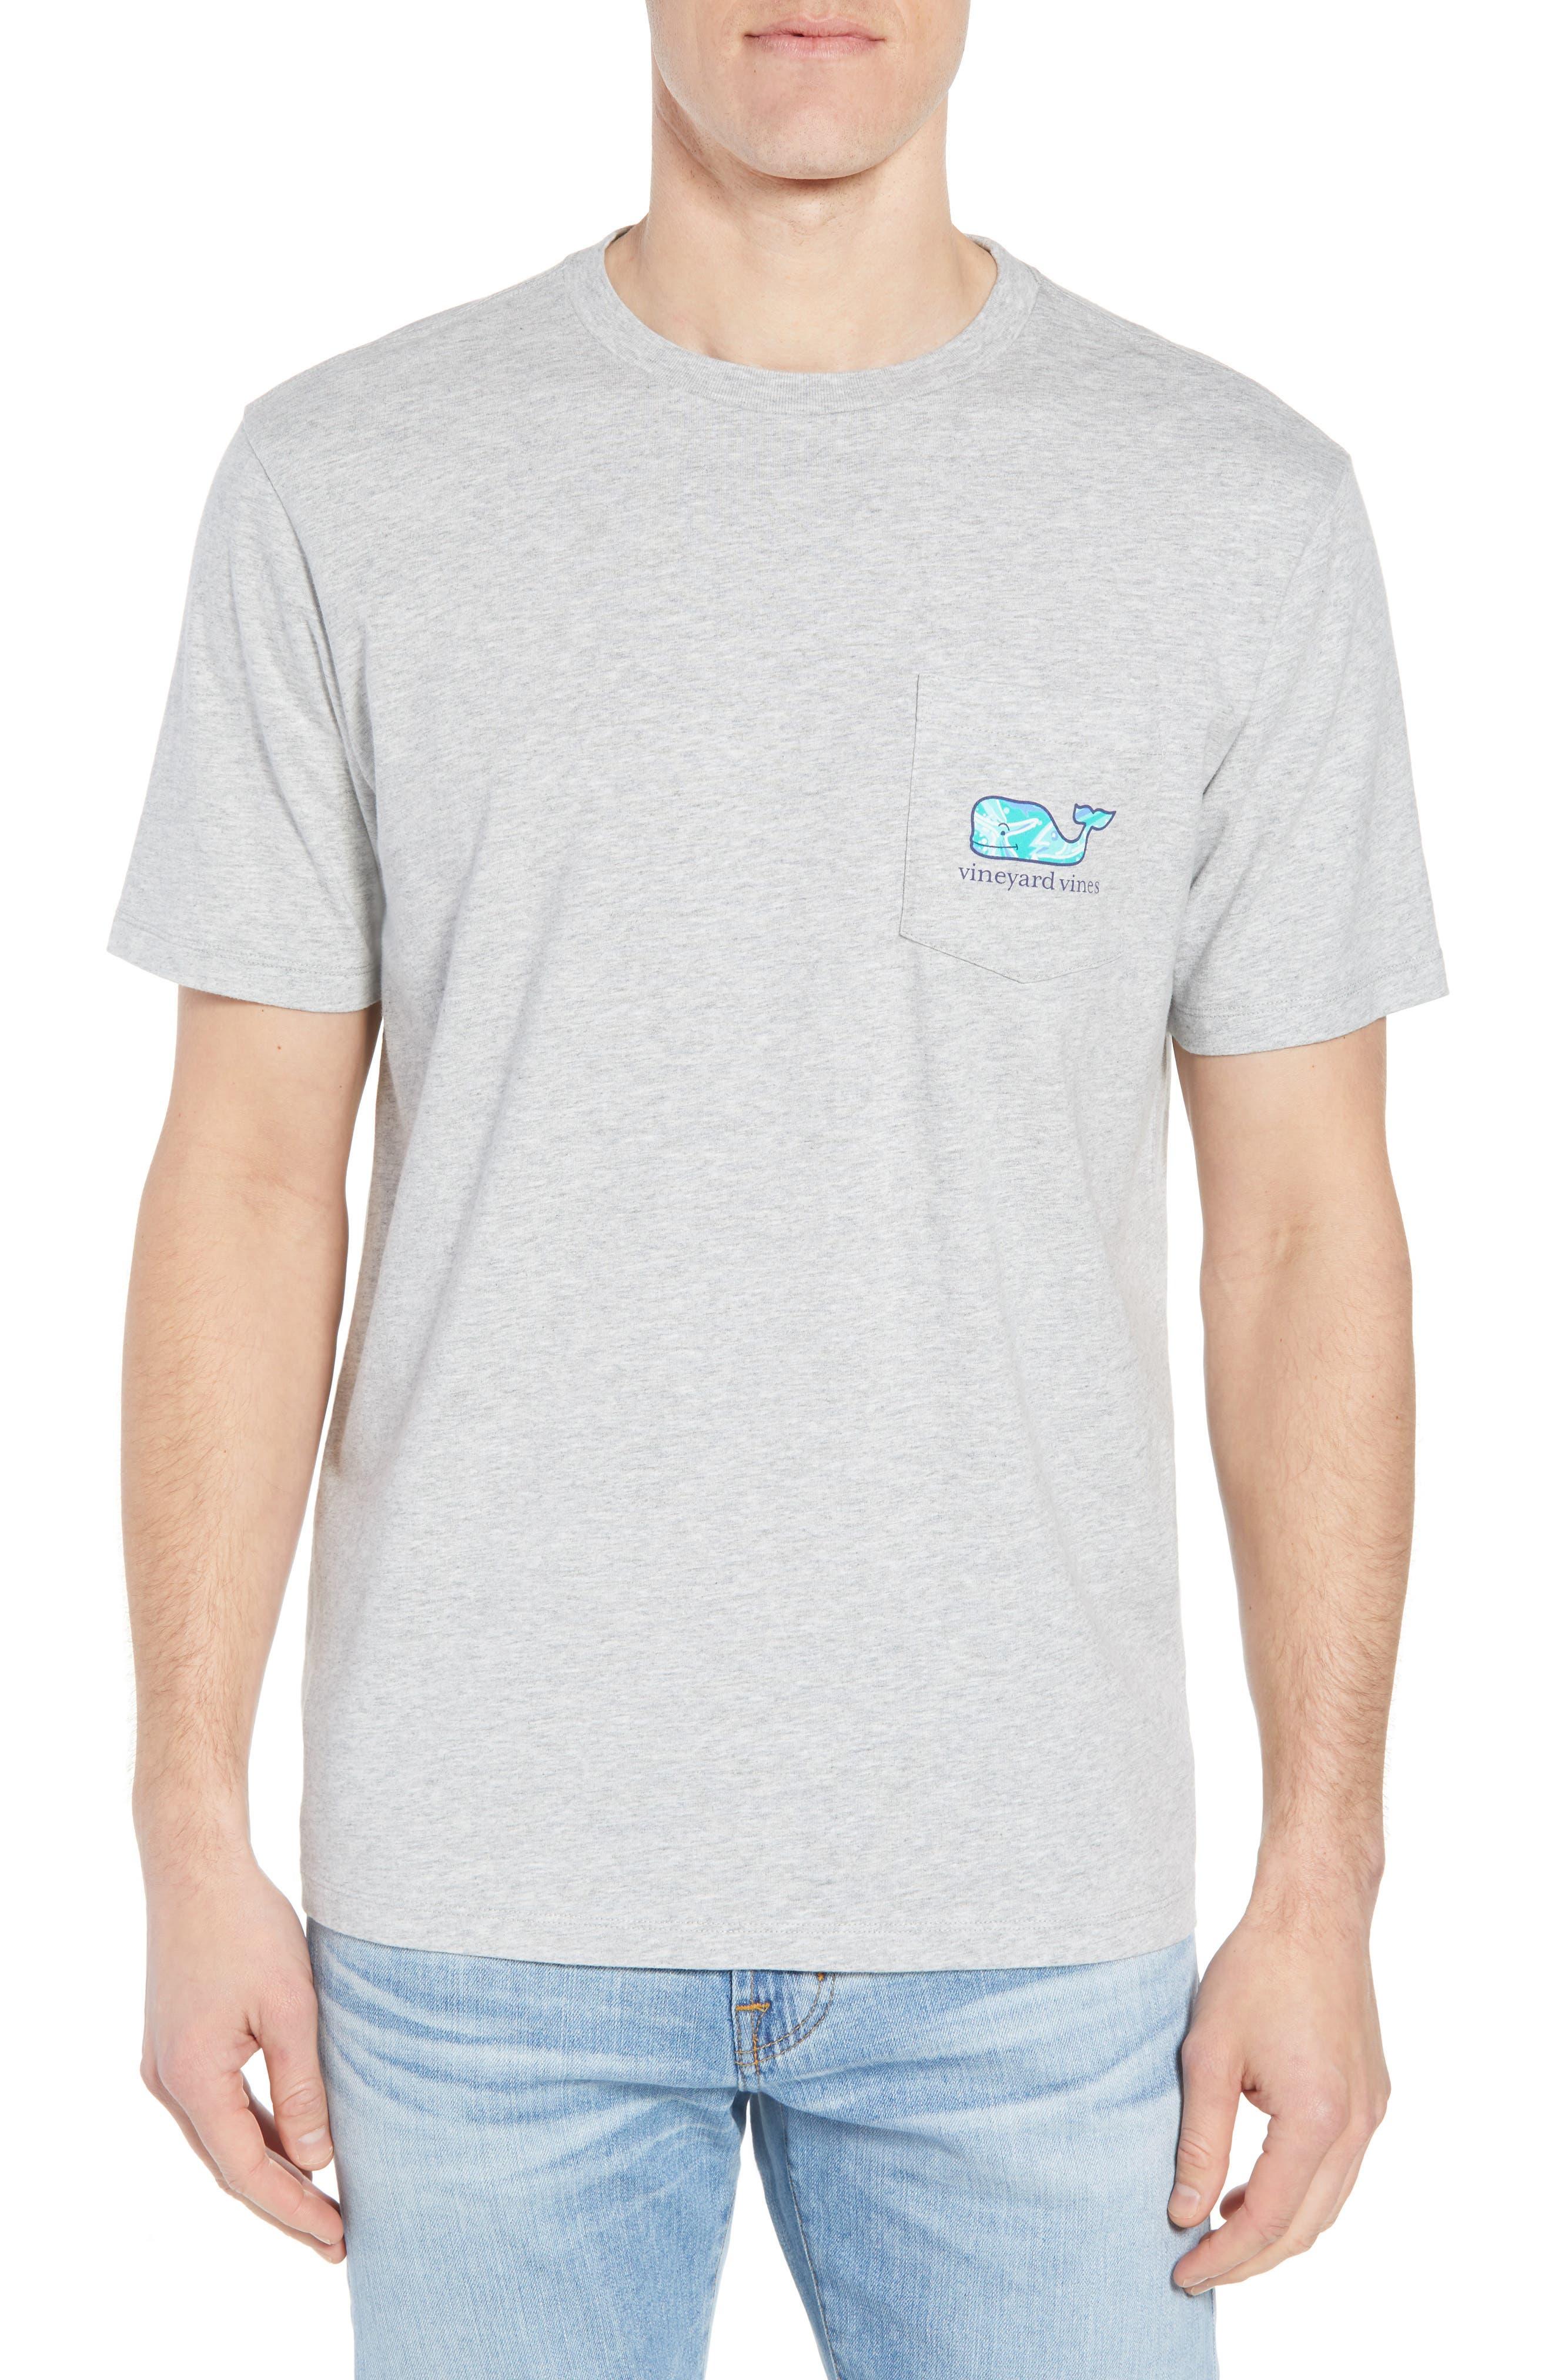 School of Tuna Regular Fit Pocket T-Shirt,                             Main thumbnail 1, color,                             Gray Heather